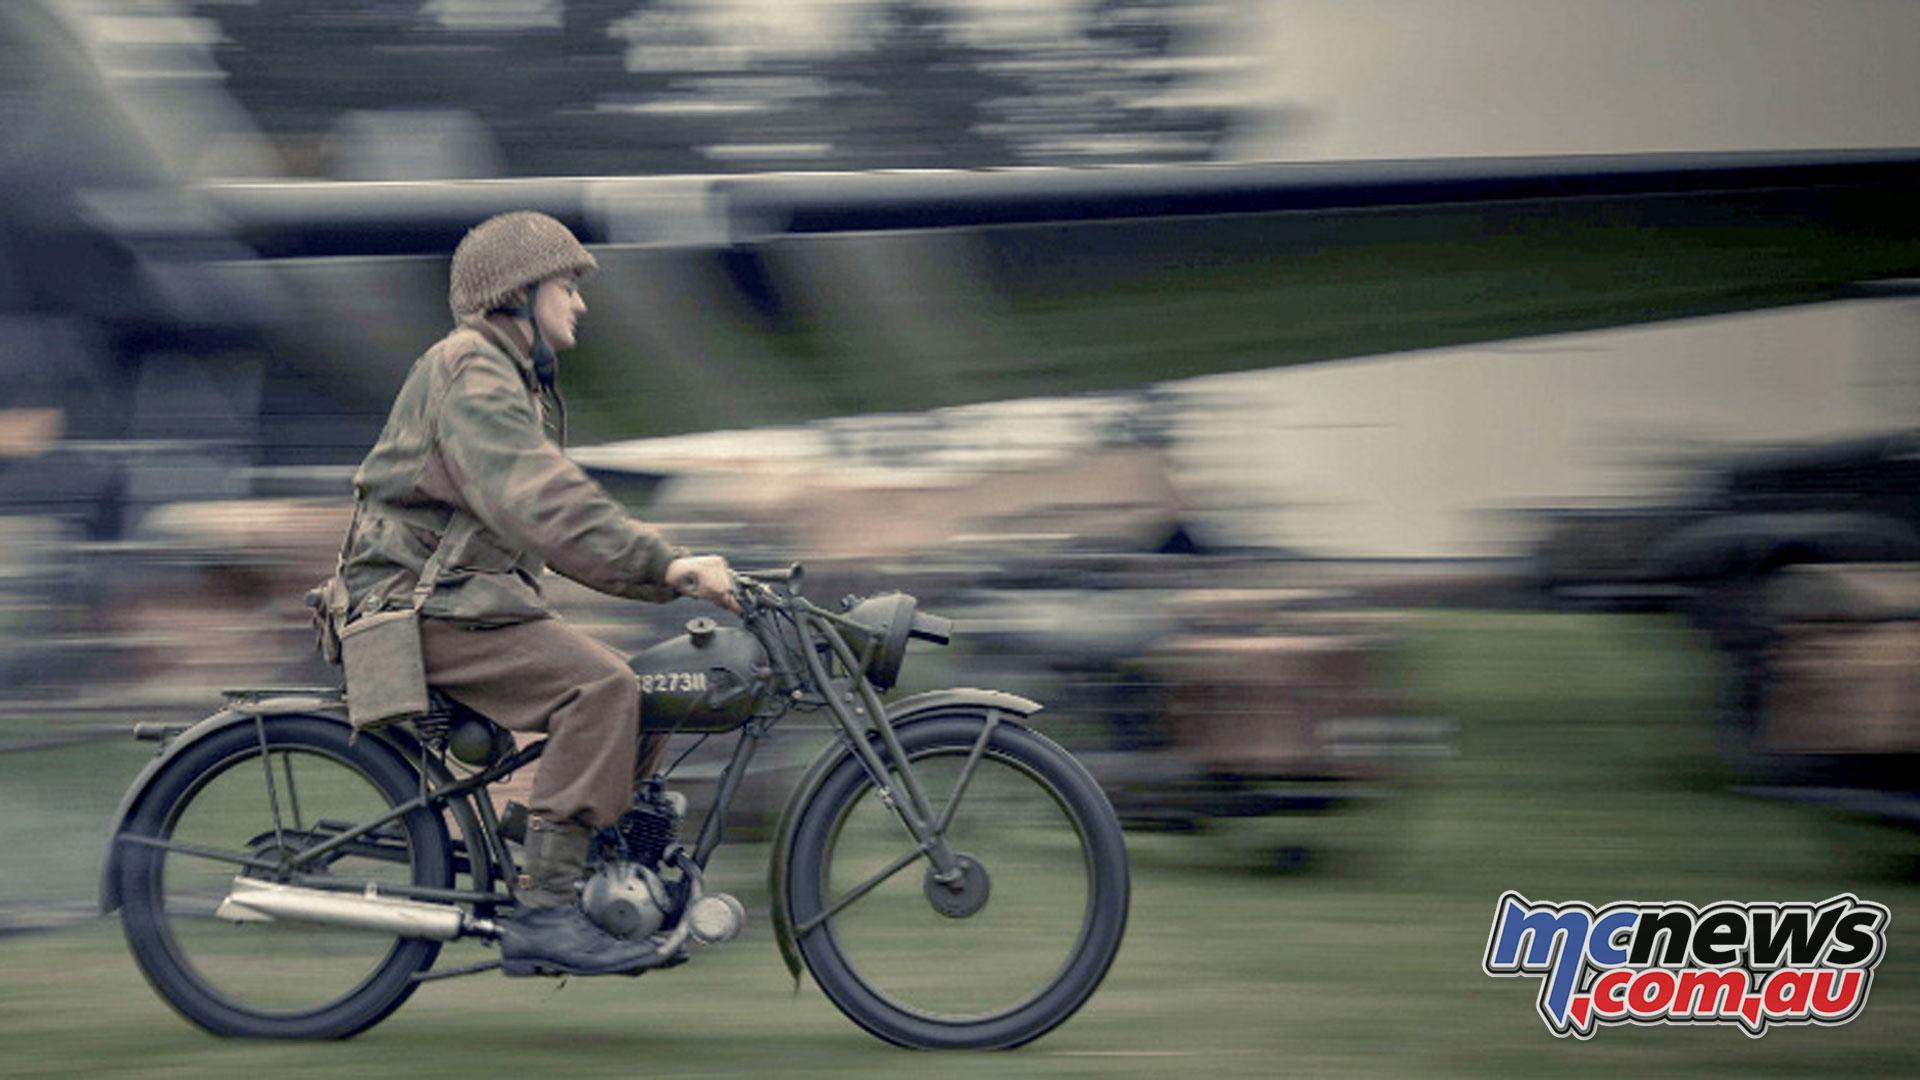 Motorcycle Museum Uk